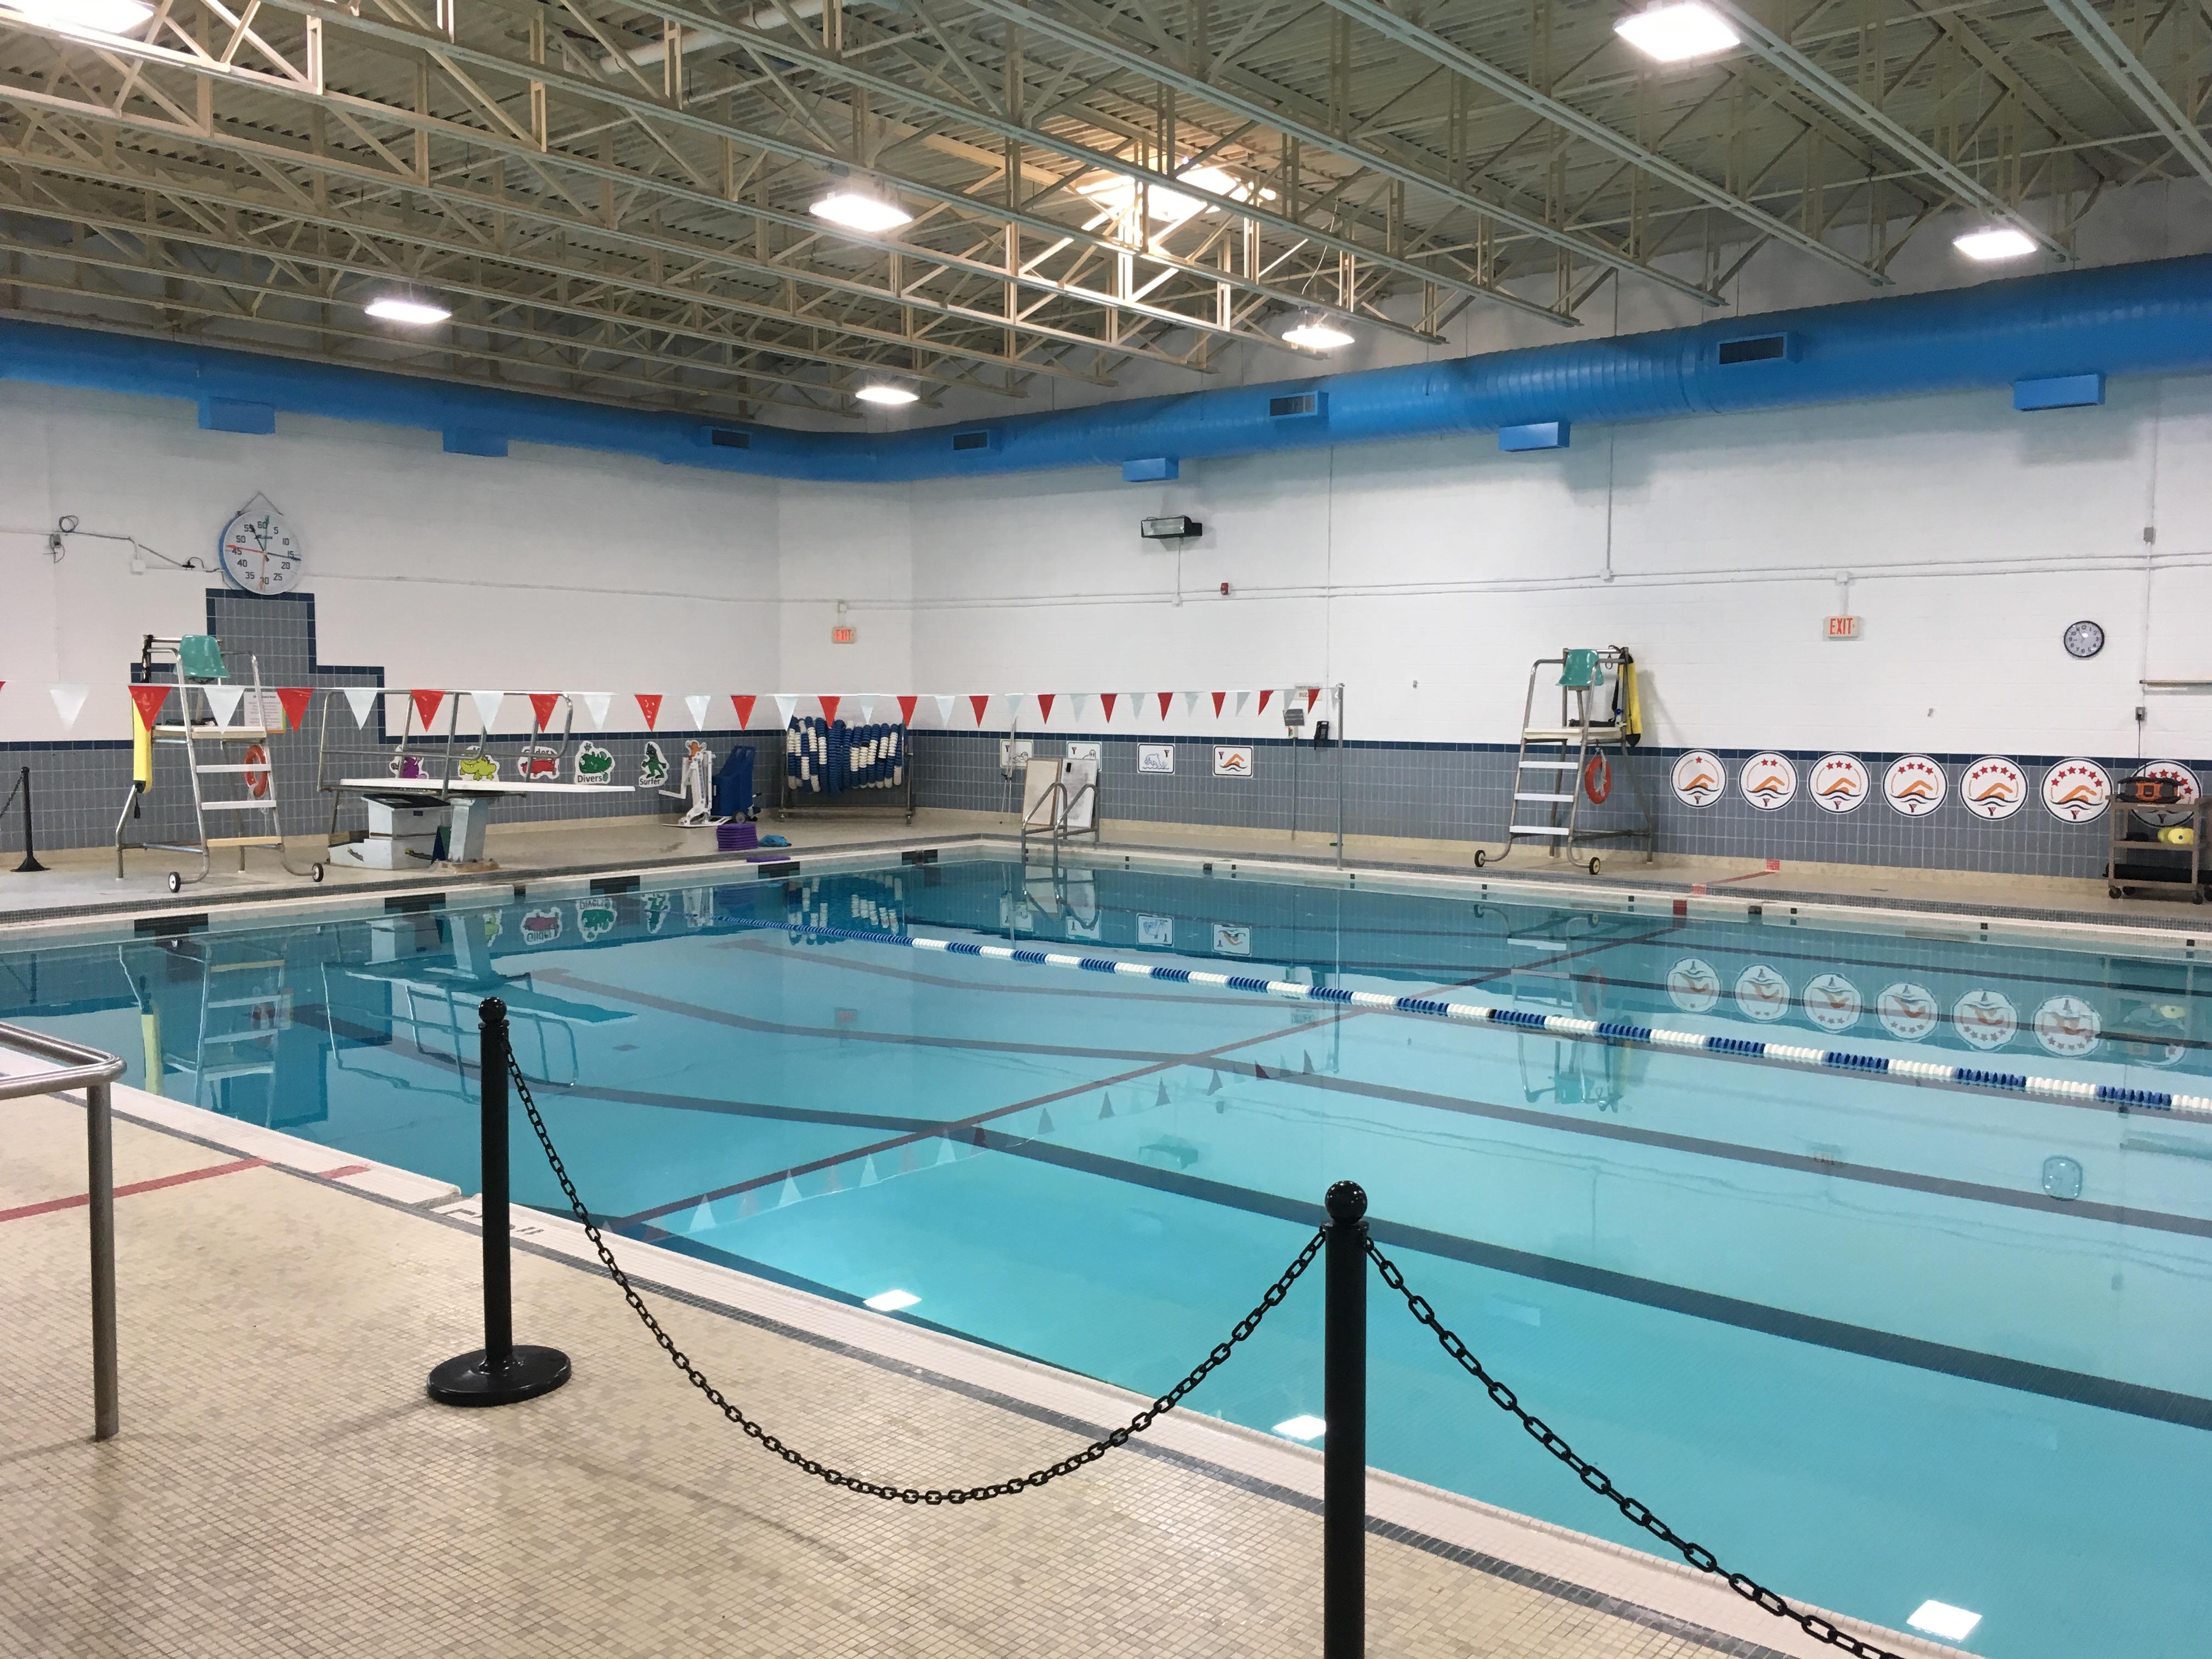 0418 - Midland Ontario YMCA